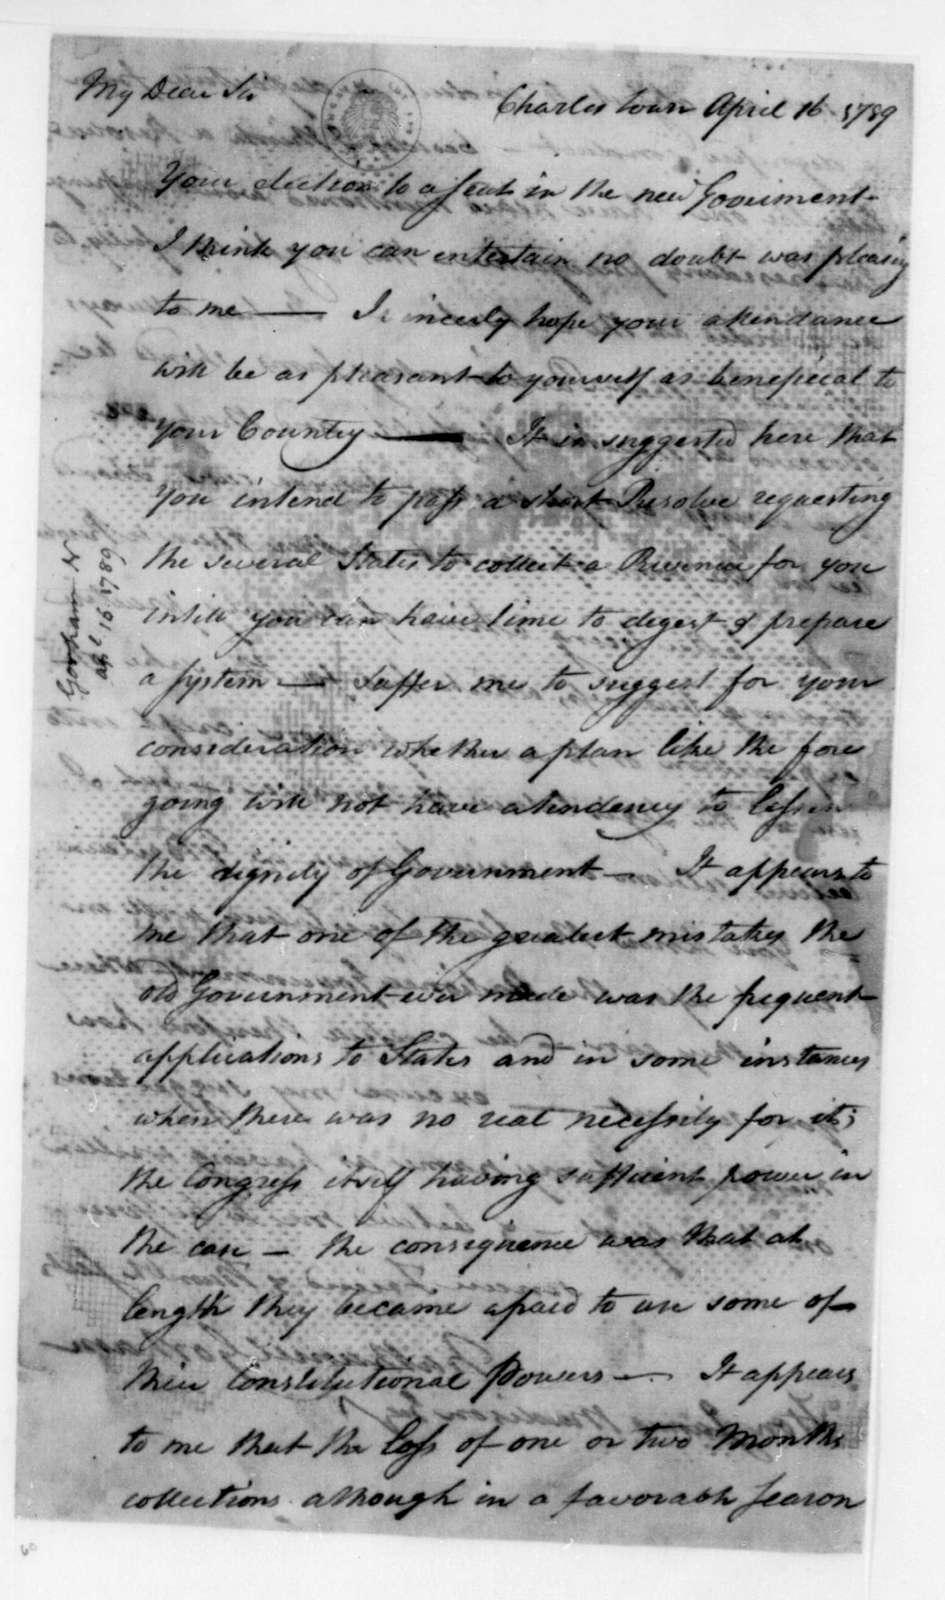 Nathaniel Gorham to James Madison, April 16, 1789.